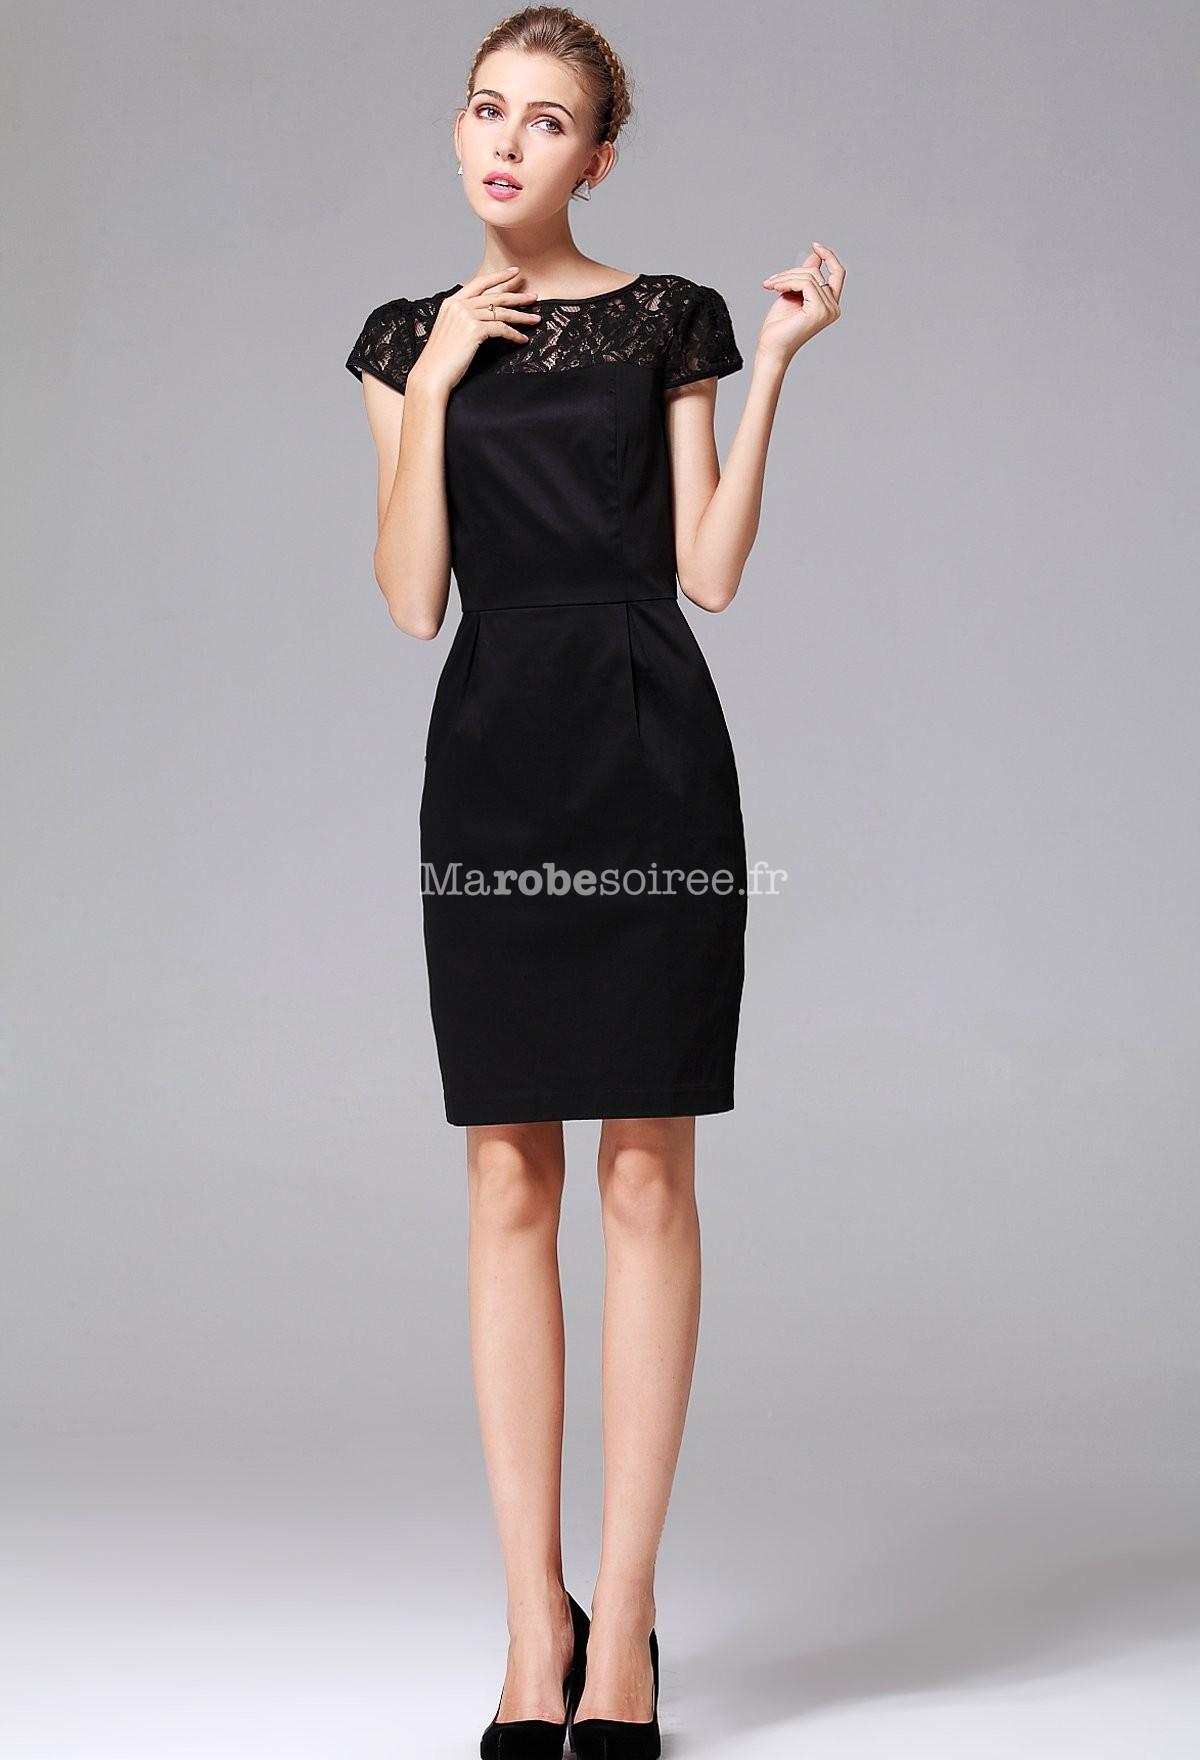 petite robe noire glamour. Black Bedroom Furniture Sets. Home Design Ideas